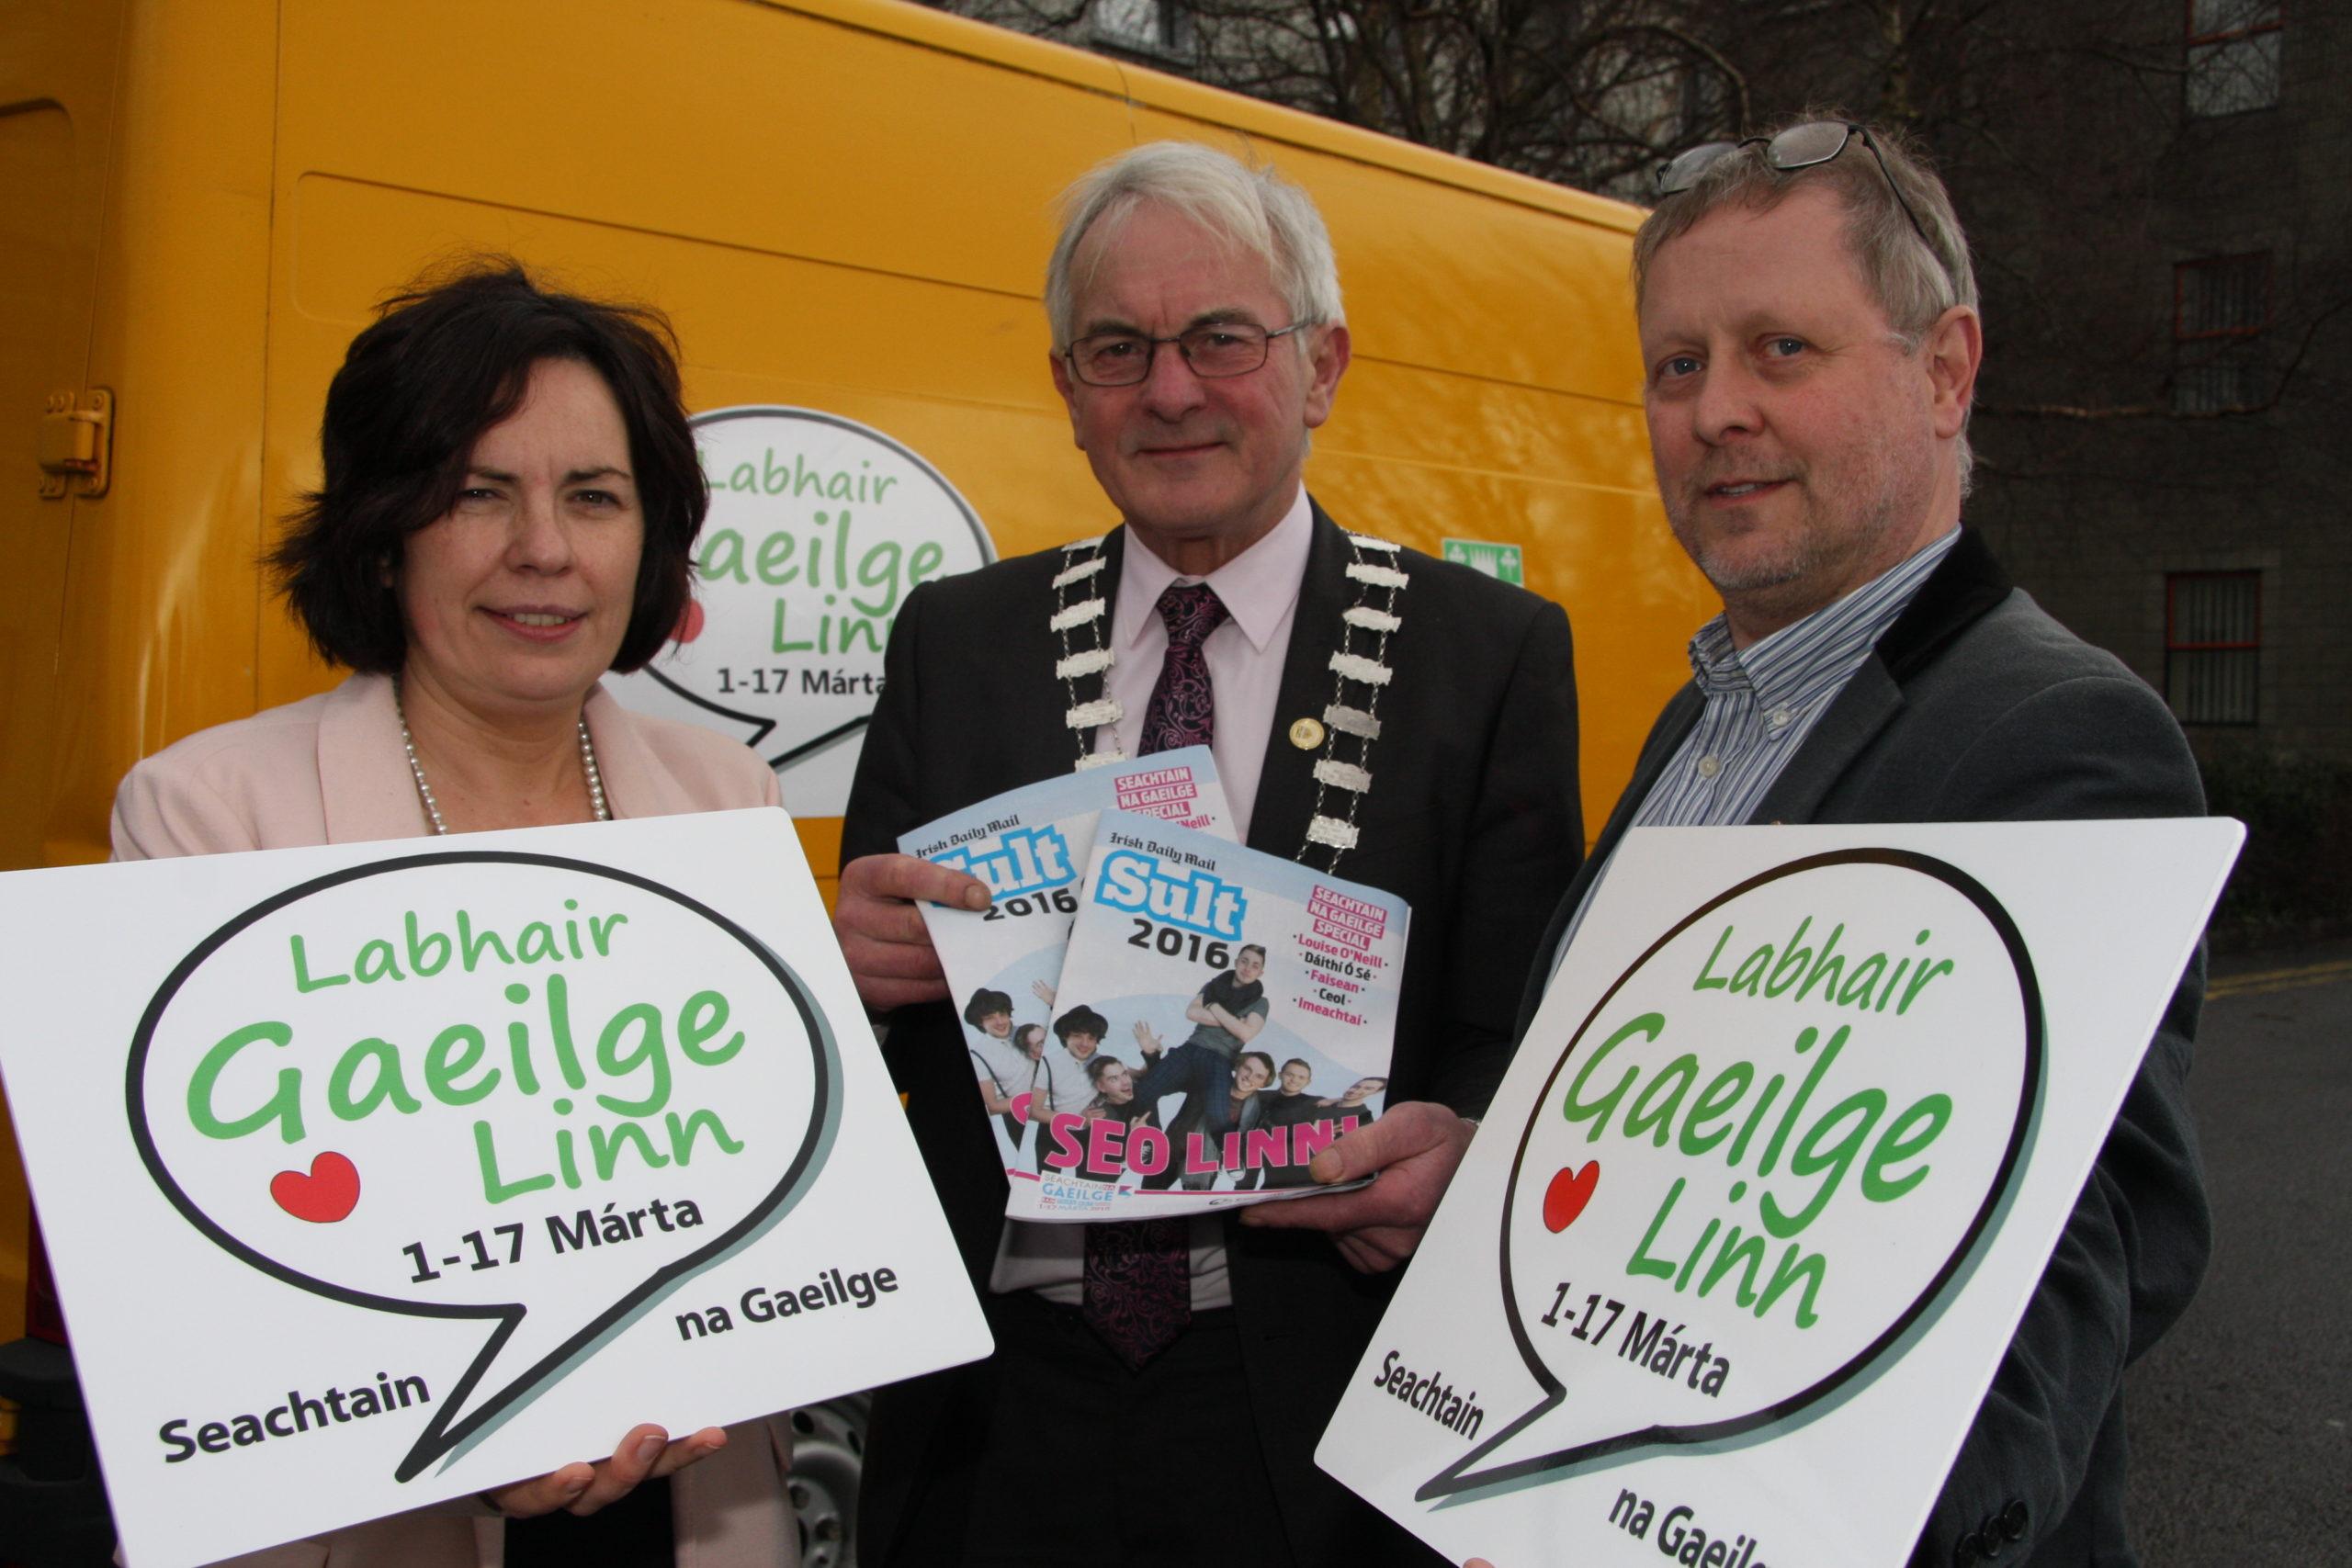 Above, launching the Kerry County Council programme of events for Seachtain na Gaeilge are Moira Murrell (chief executive), Cllr Pat McCarthy (cathaoirleach) and Roibeard Ó hEartáin (Oifigeach Forbartha Gaeilge).